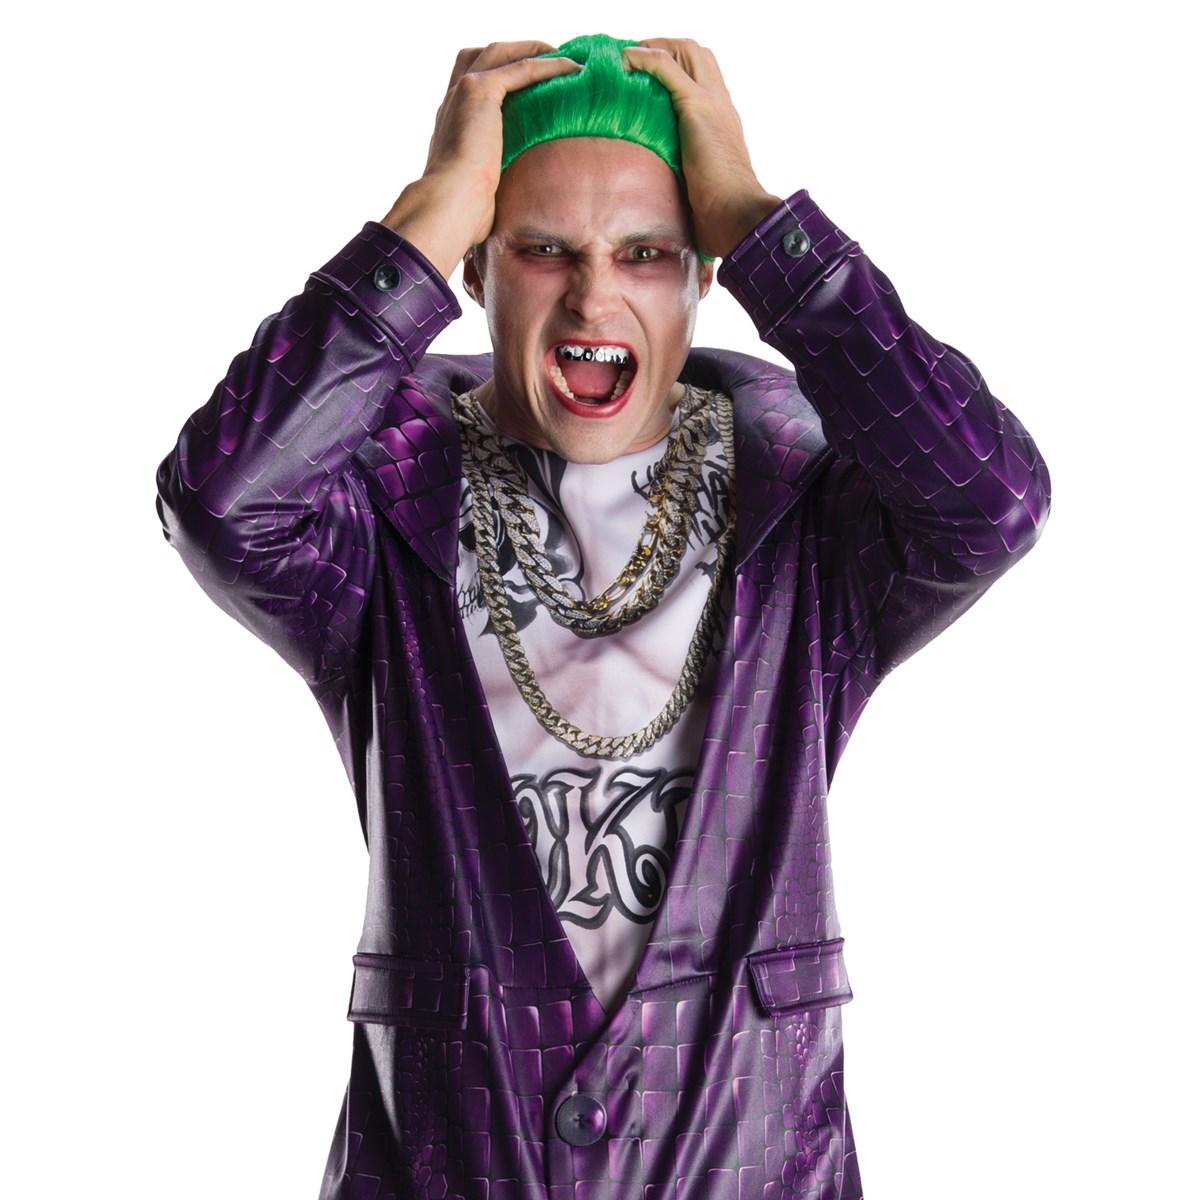 The joker without makeup